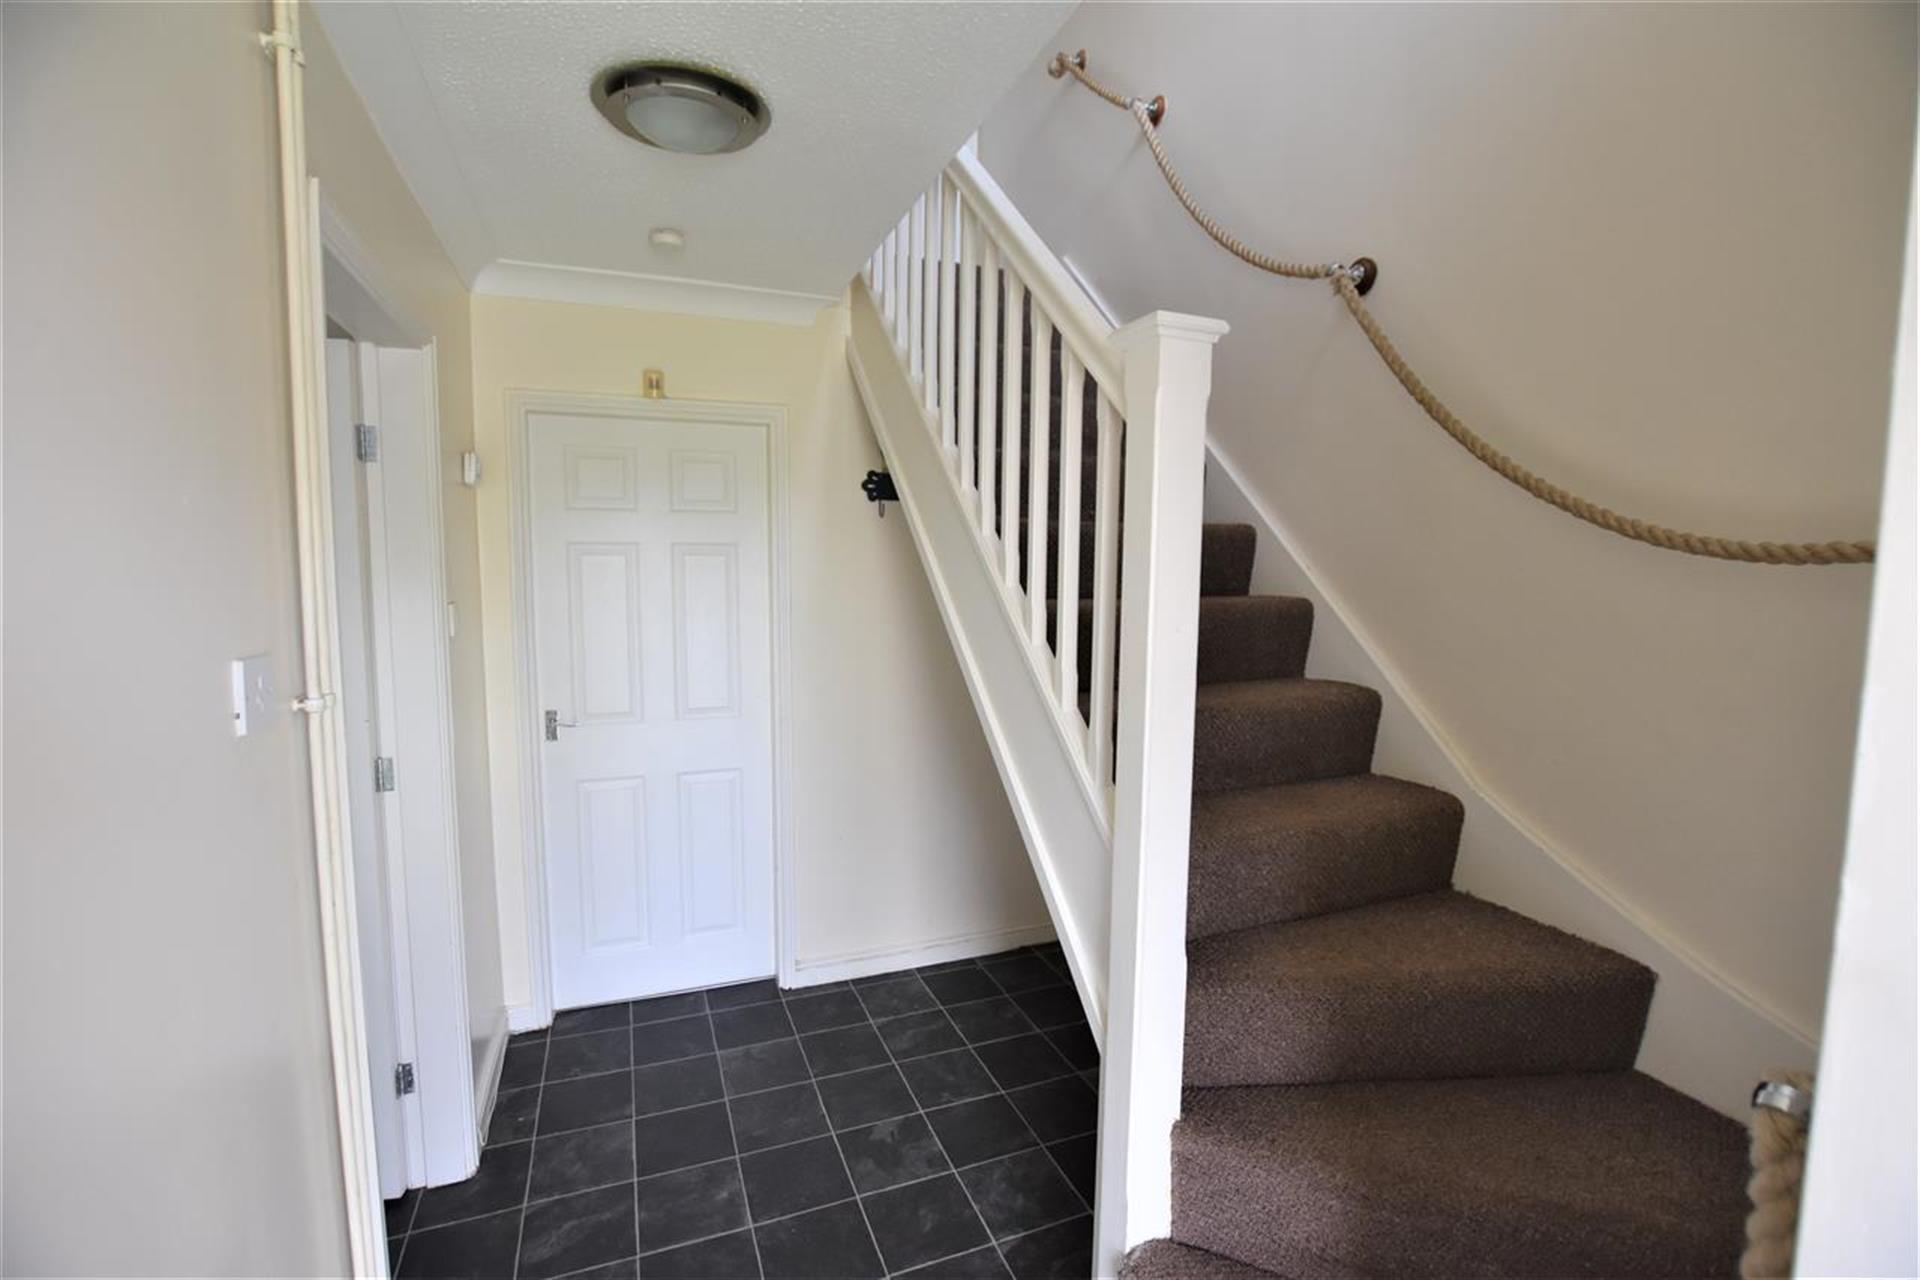 2 Bedroom House For Sale - Hallway